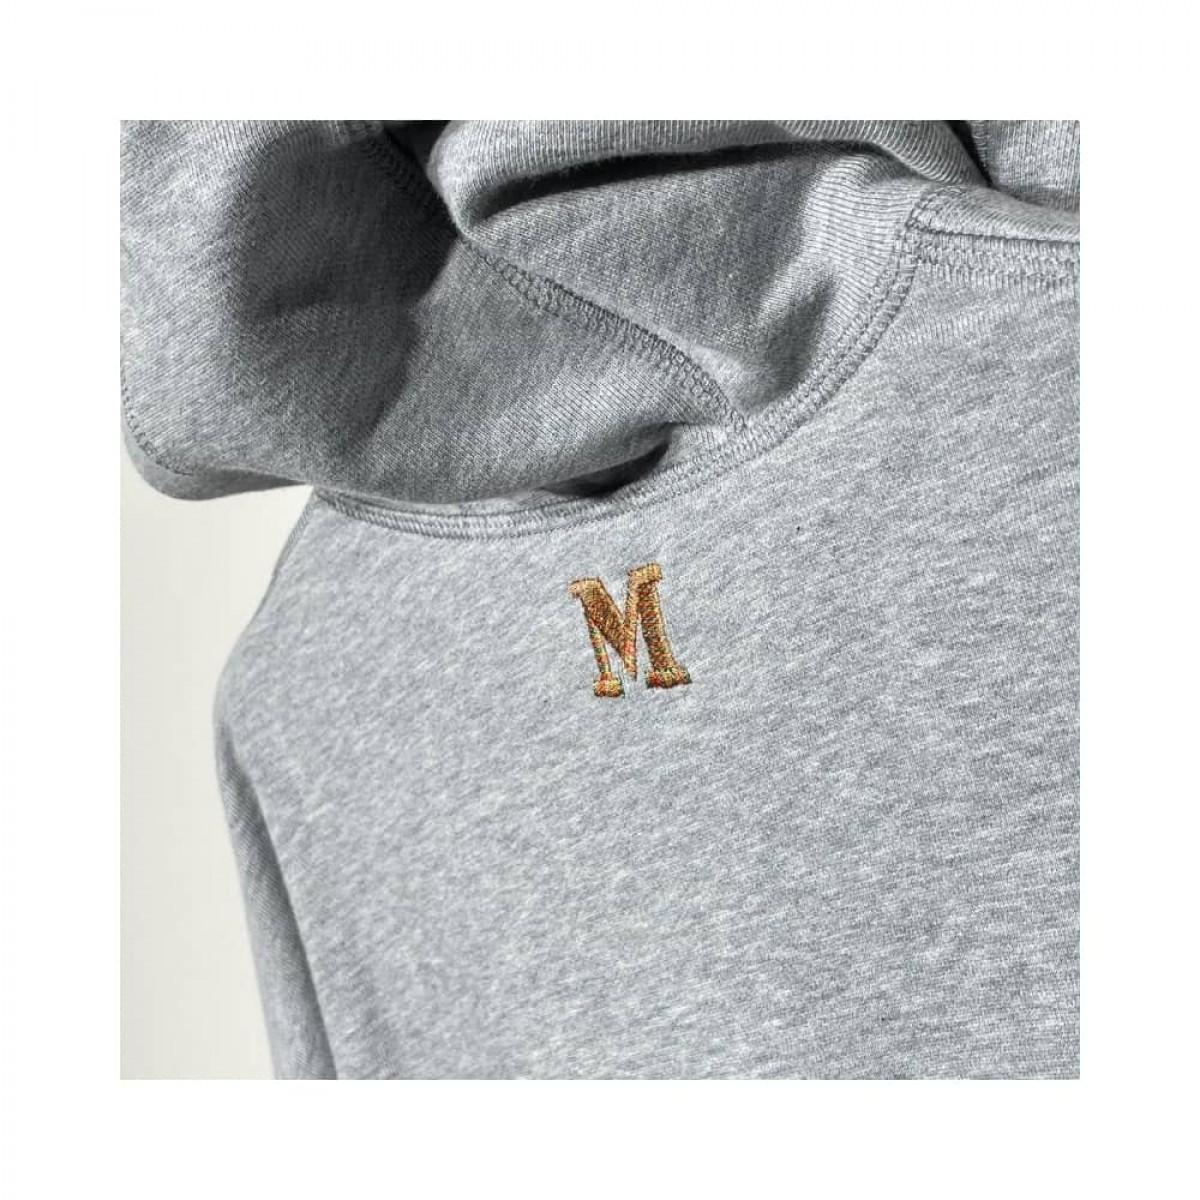 m missoni hætte sweat - grey melange - logo detalje